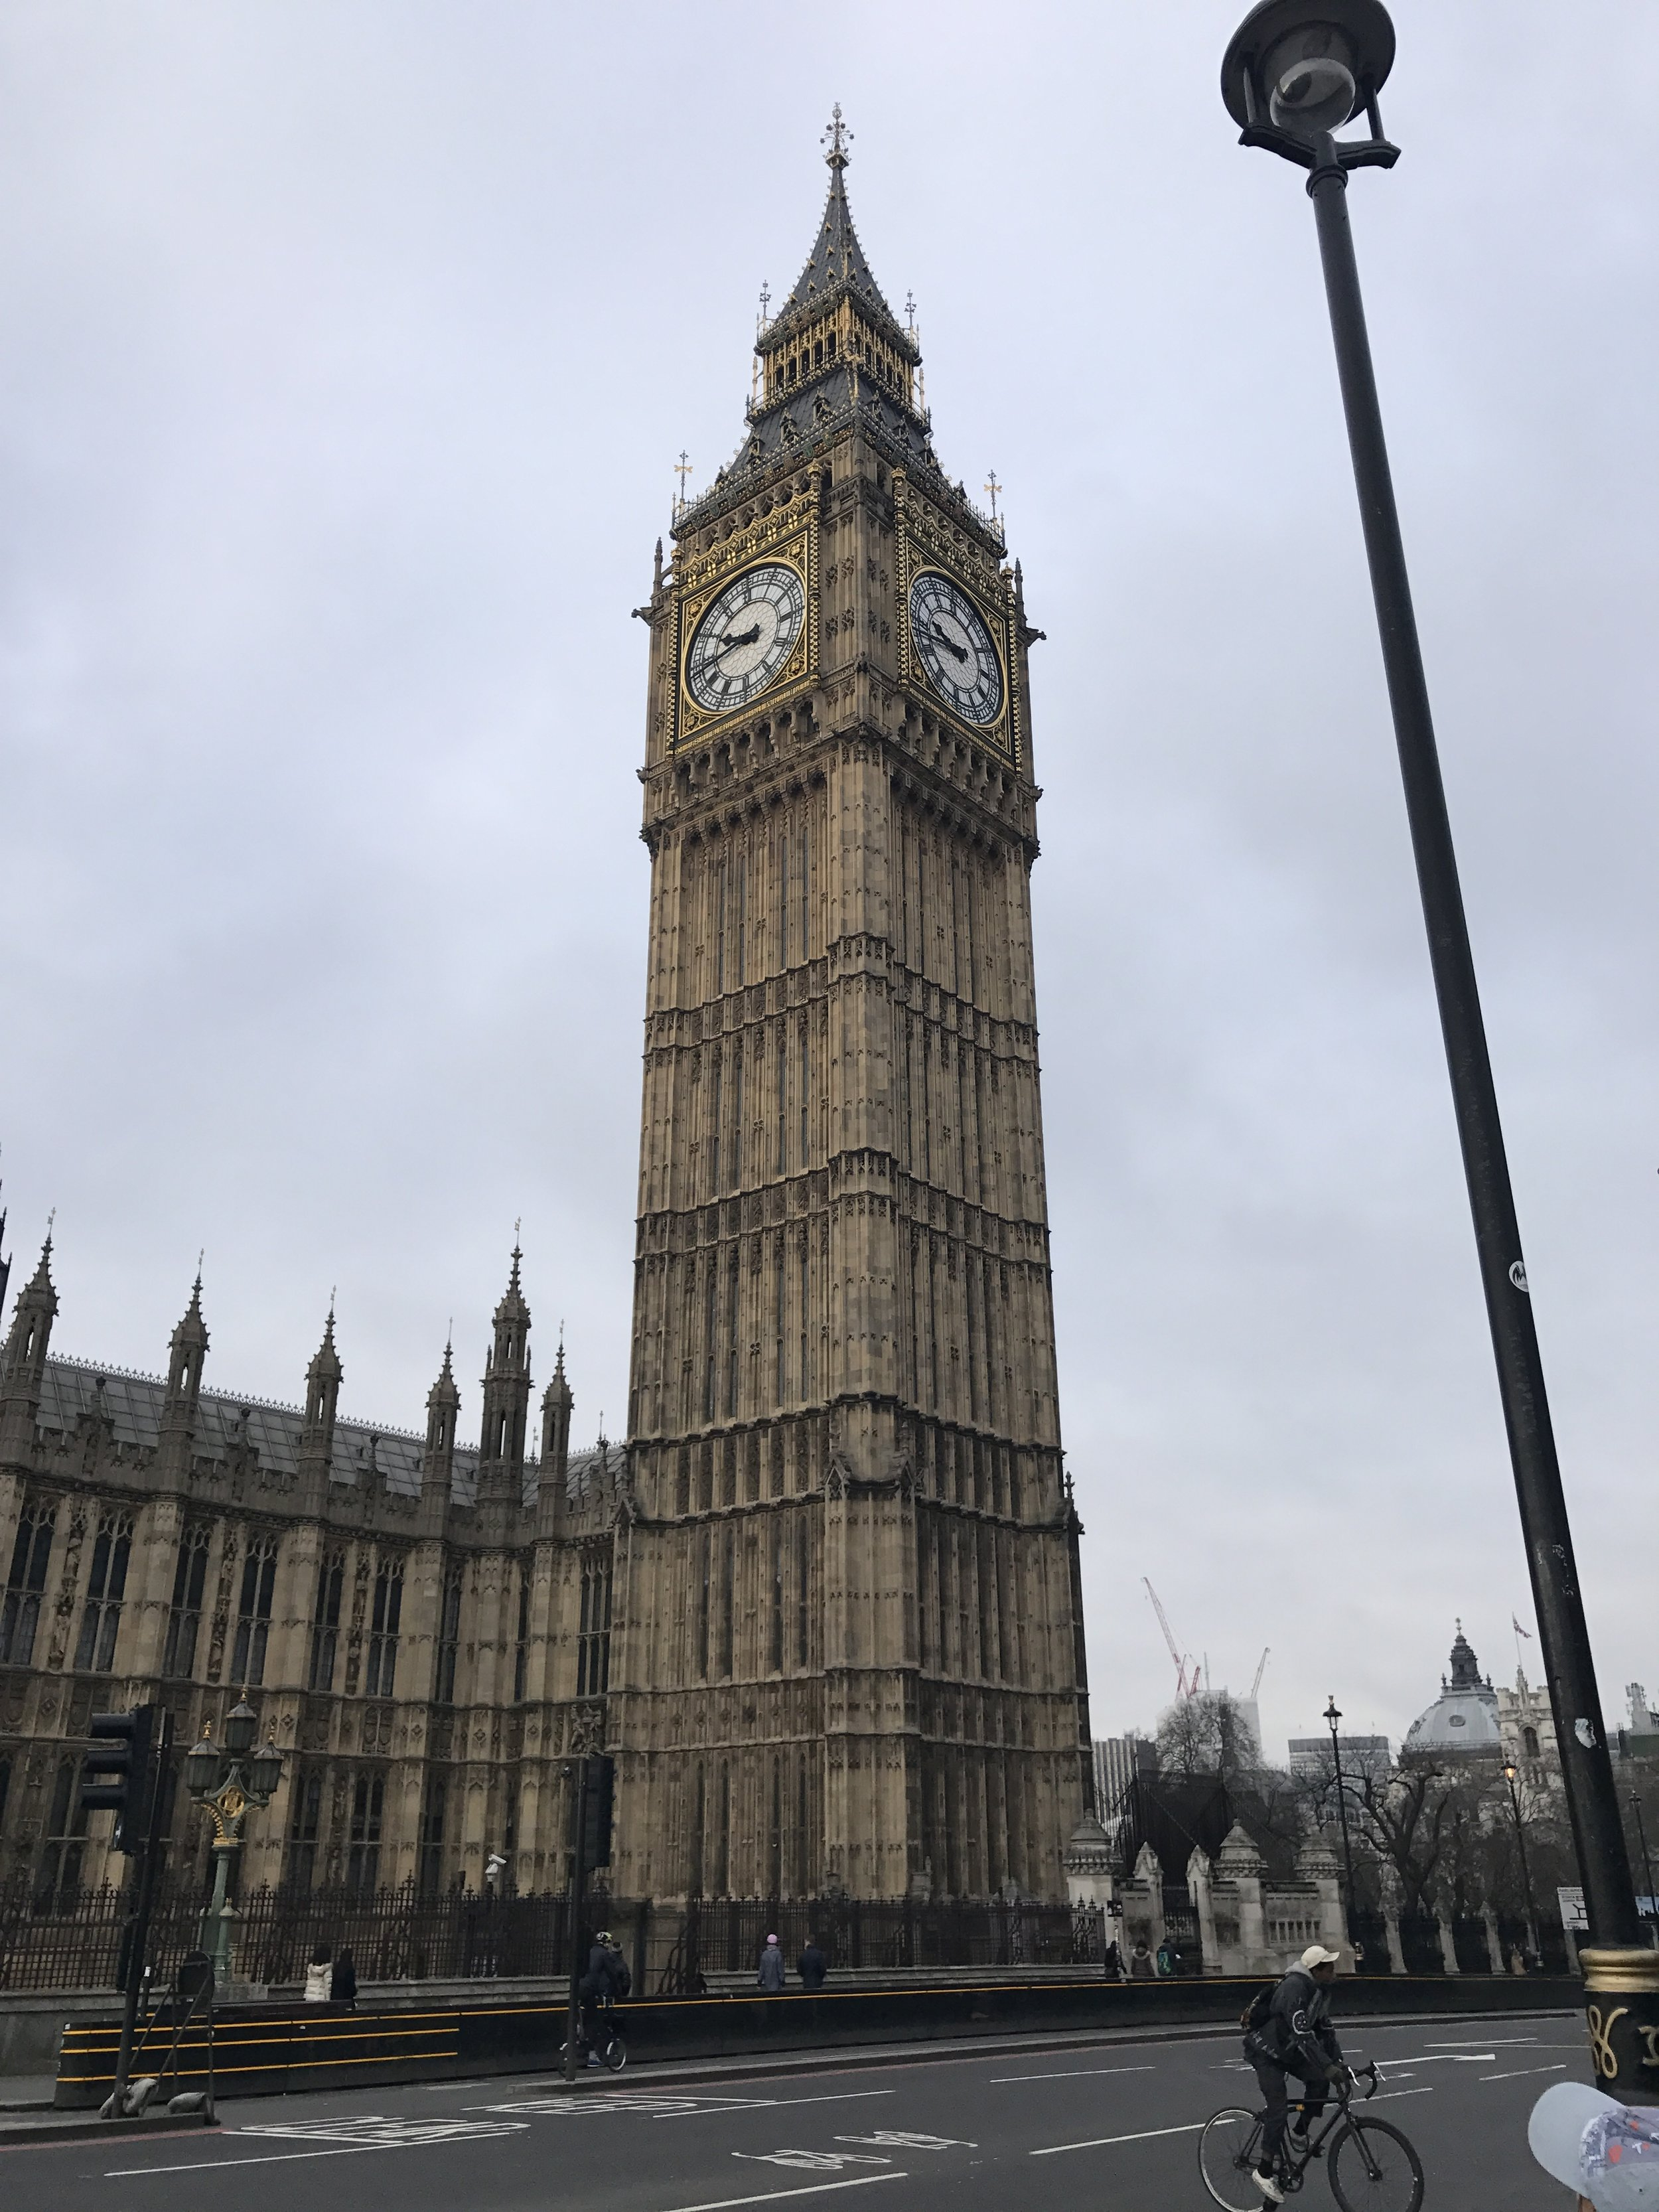 Mother/Daughter trip in London